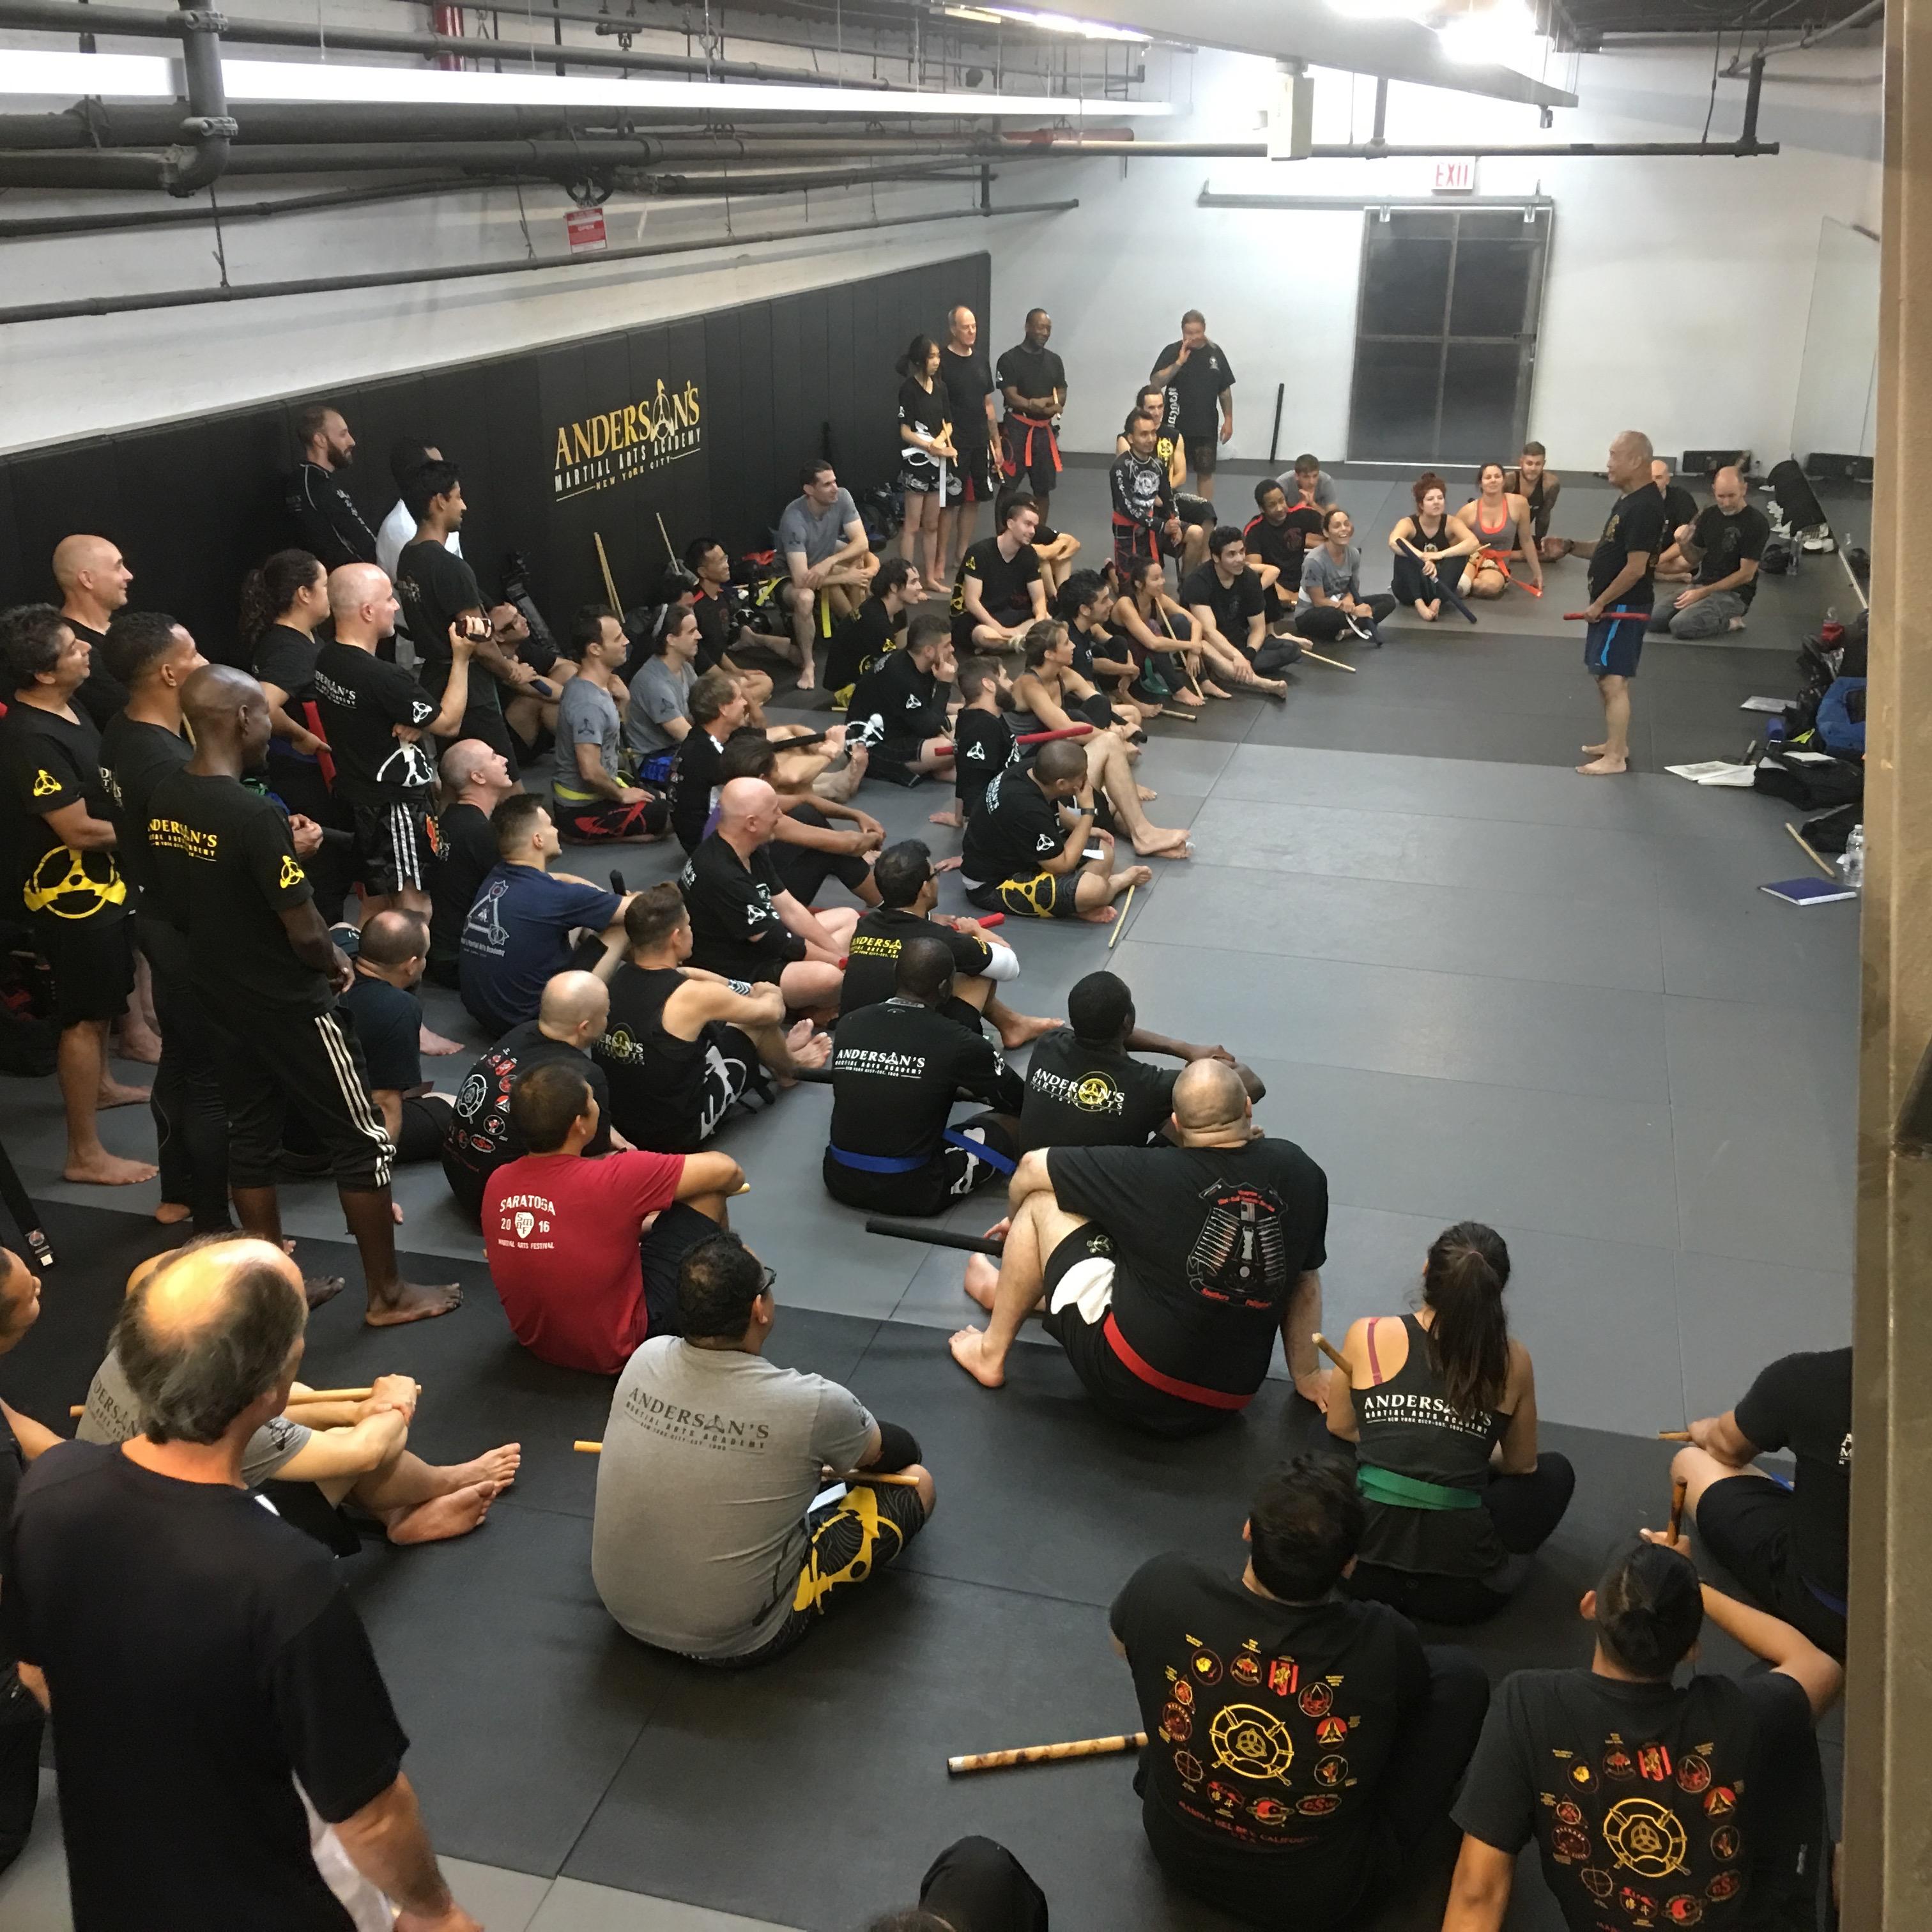 Guro Dan Inosnato Teaching Jeet Kune Do, Kali and Silat At Andersons Martial Arts Academy